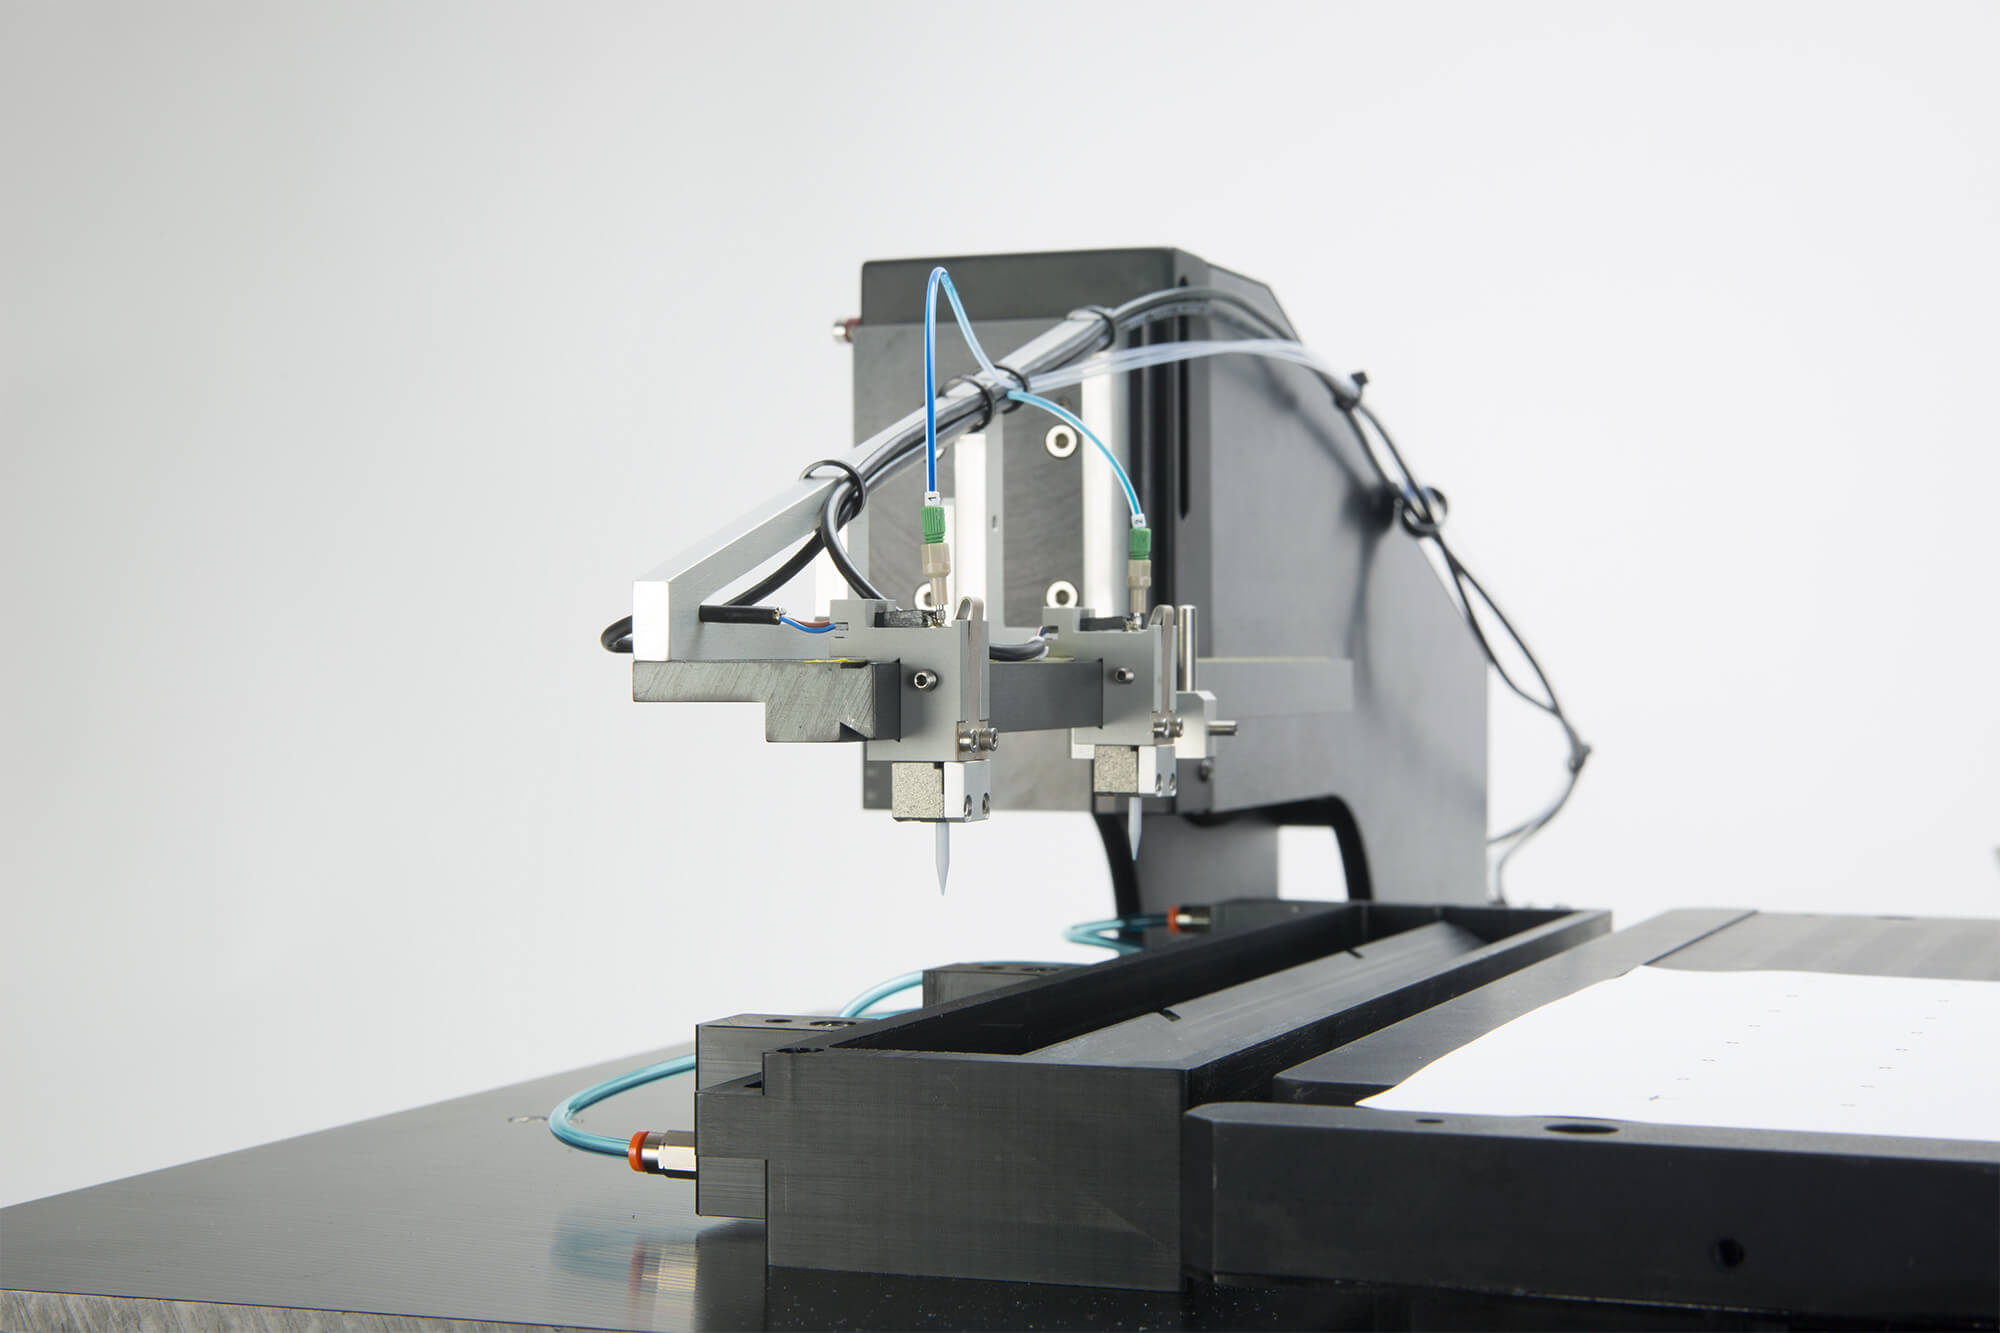 GlucoDot biosensor dispensing system 2 channels